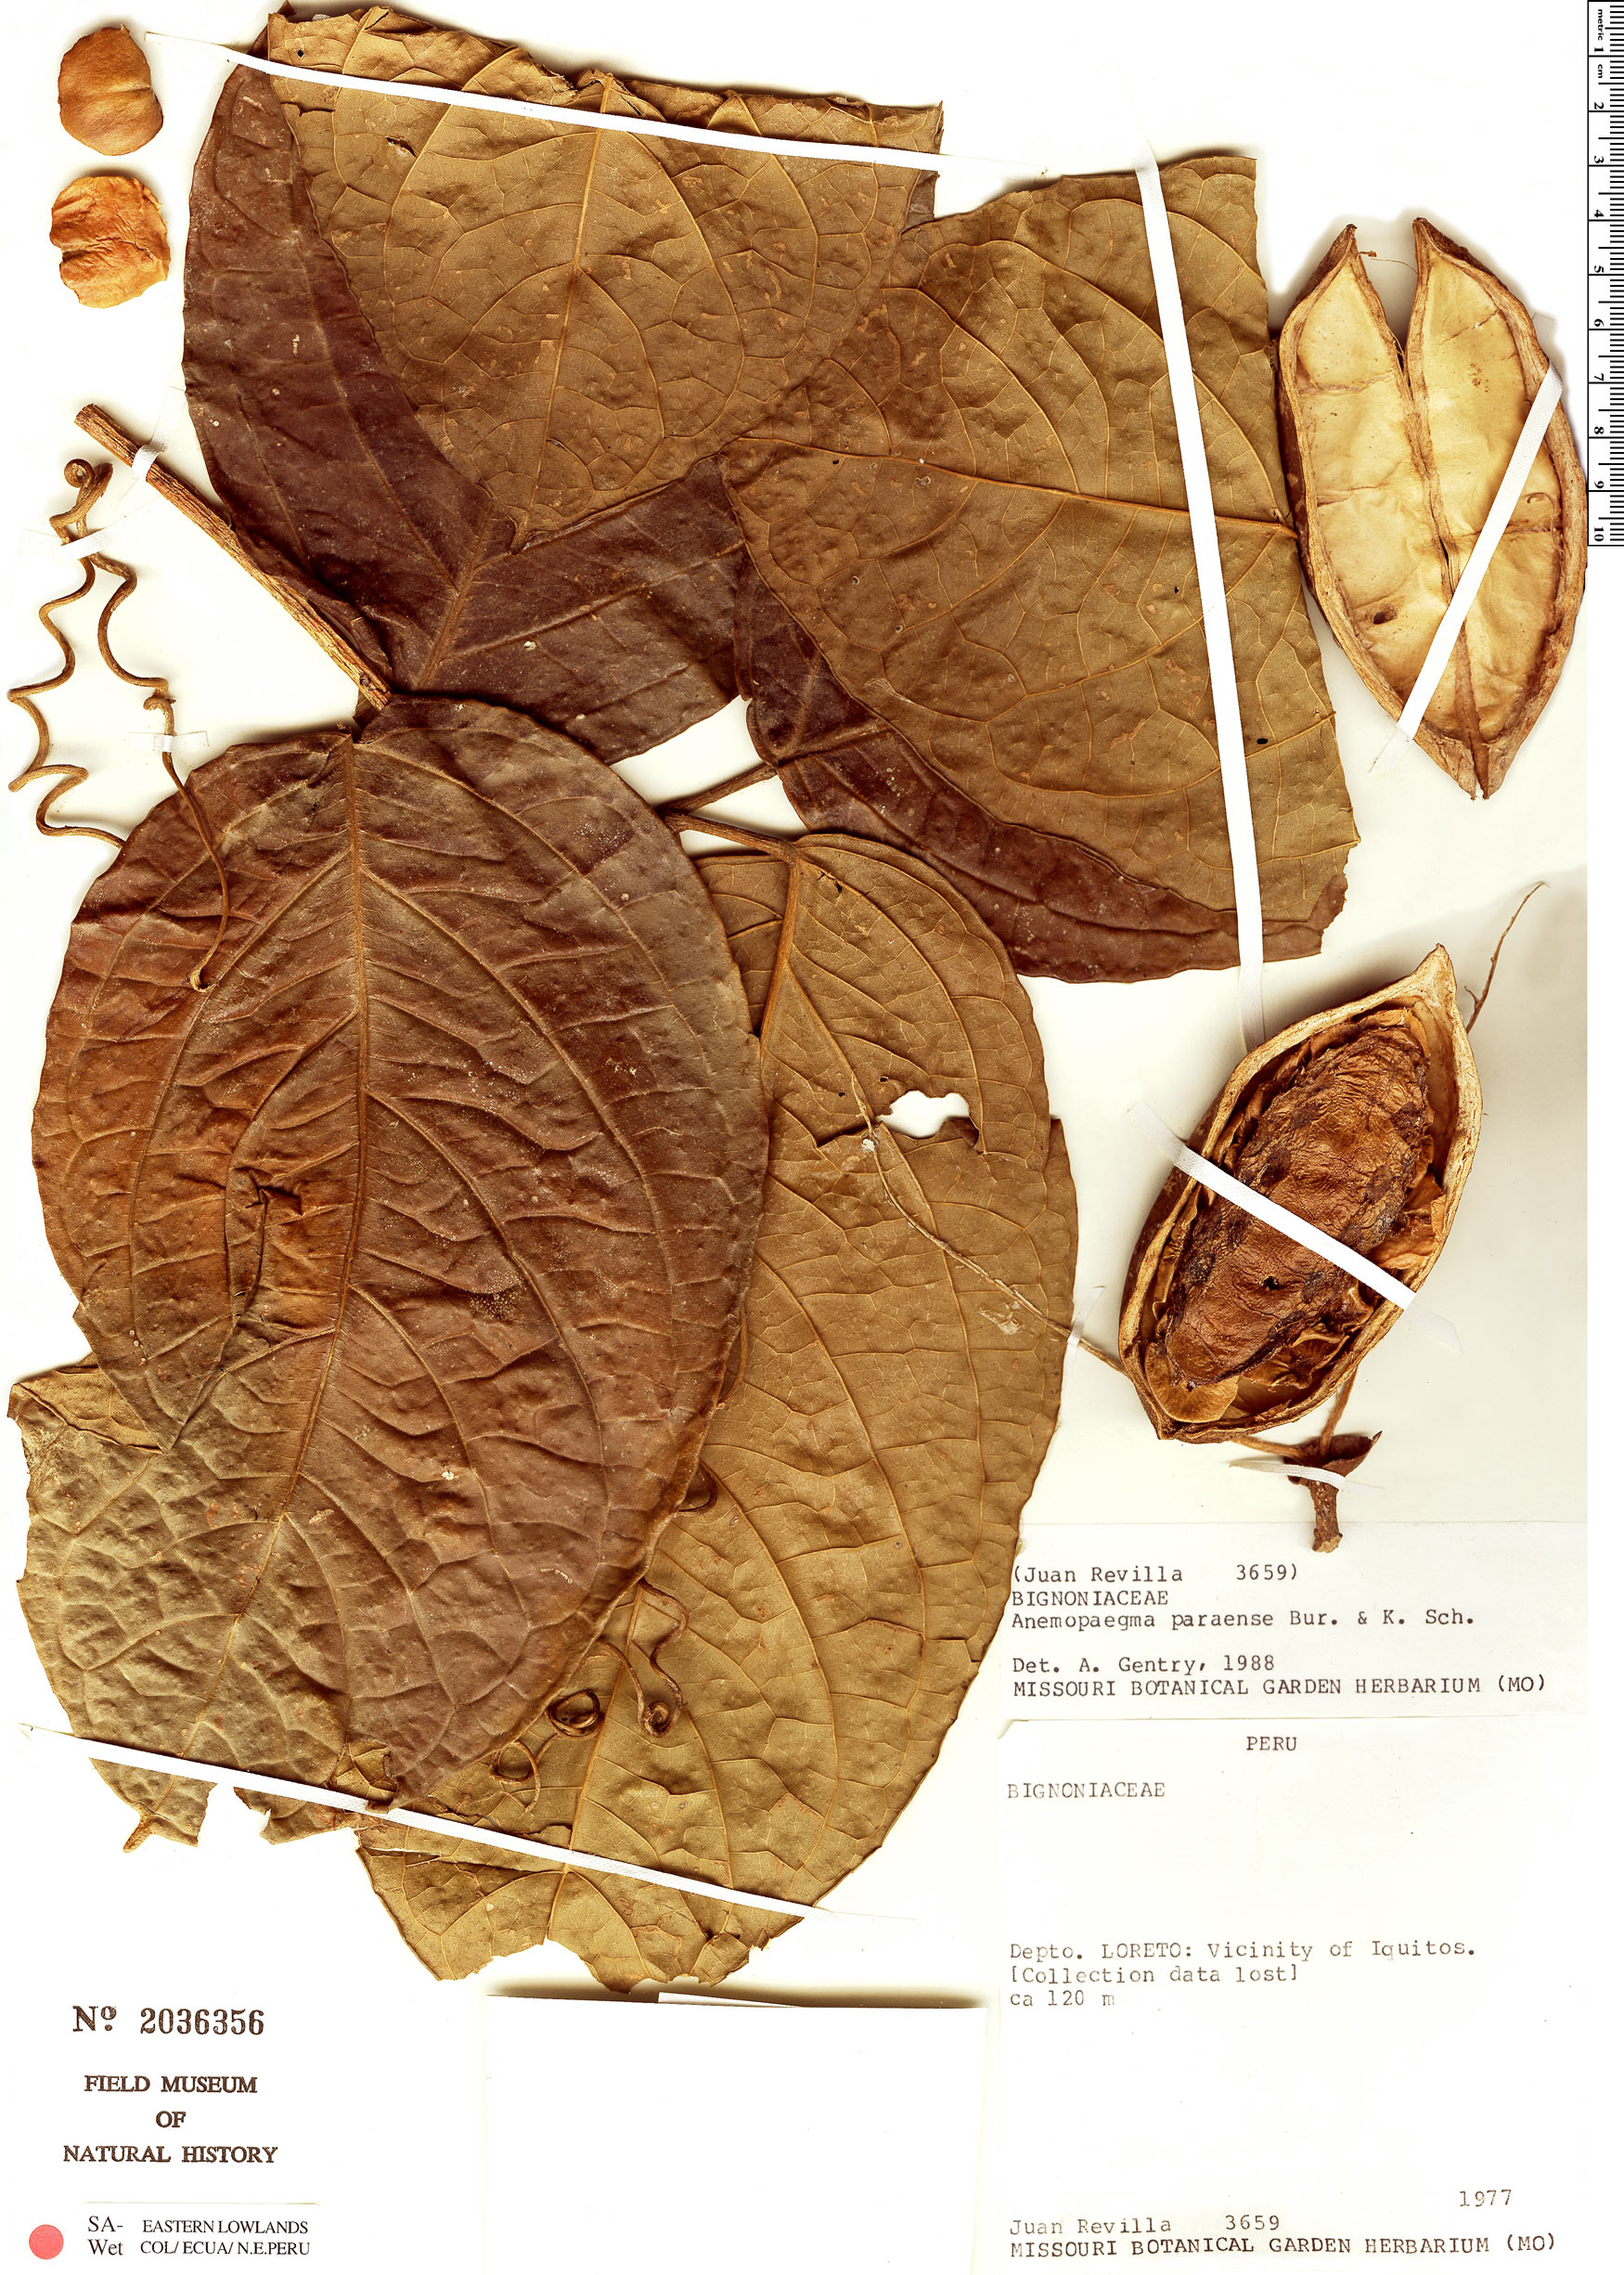 Specimen: Anemopaegma paraense